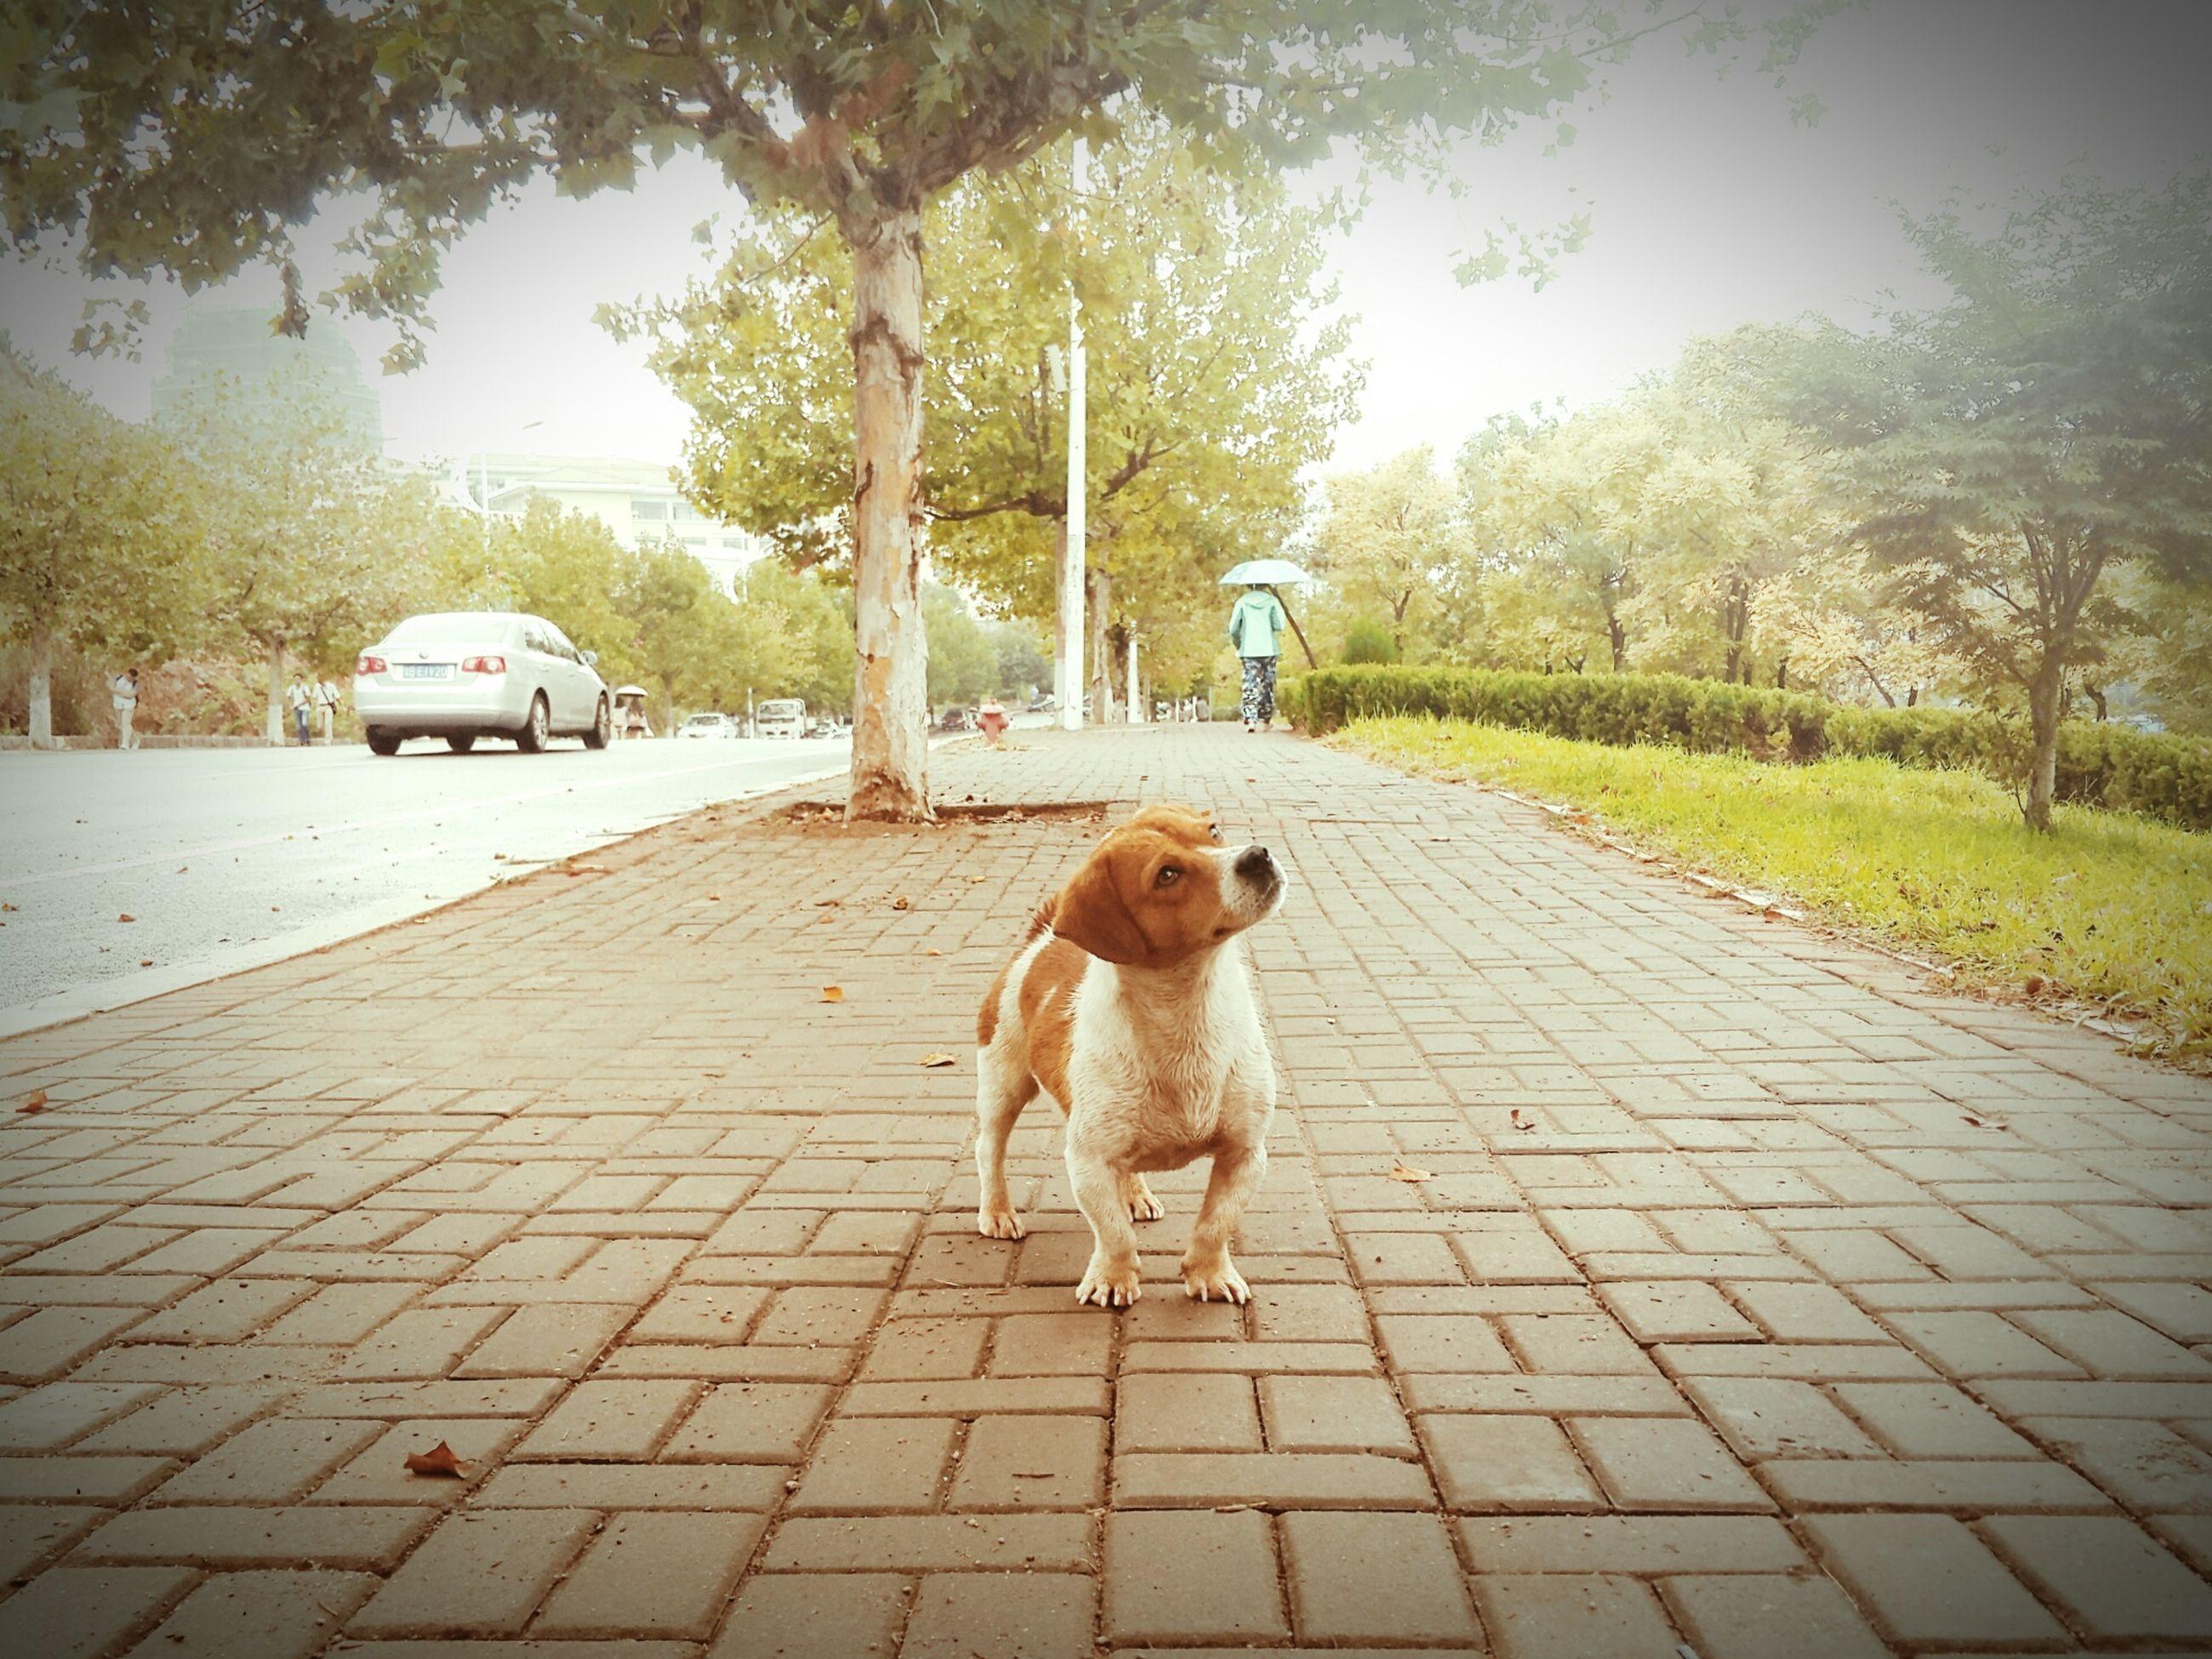 animal themes, domestic animals, mammal, pets, one animal, dog, street, road, transportation, the way forward, tree, sidewalk, footpath, full length, sunlight, outdoors, car, cobblestone, walking, standing